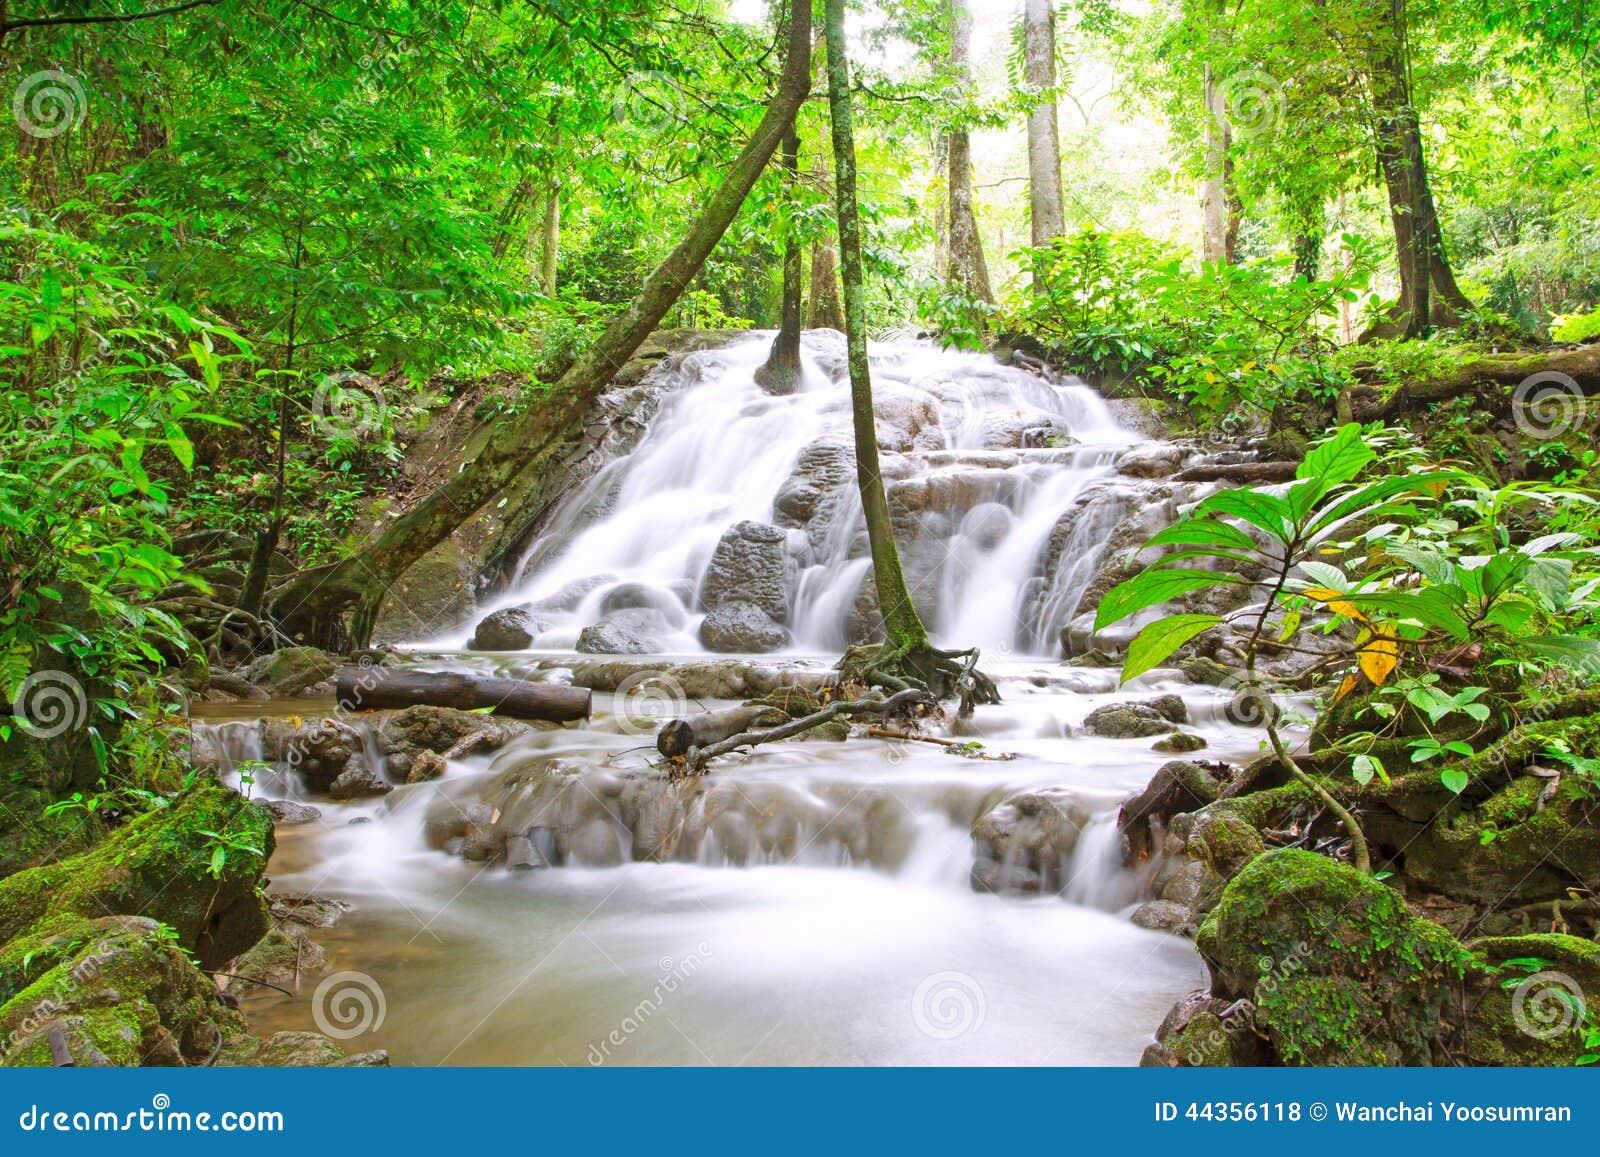 Cascata tropicale in foresta